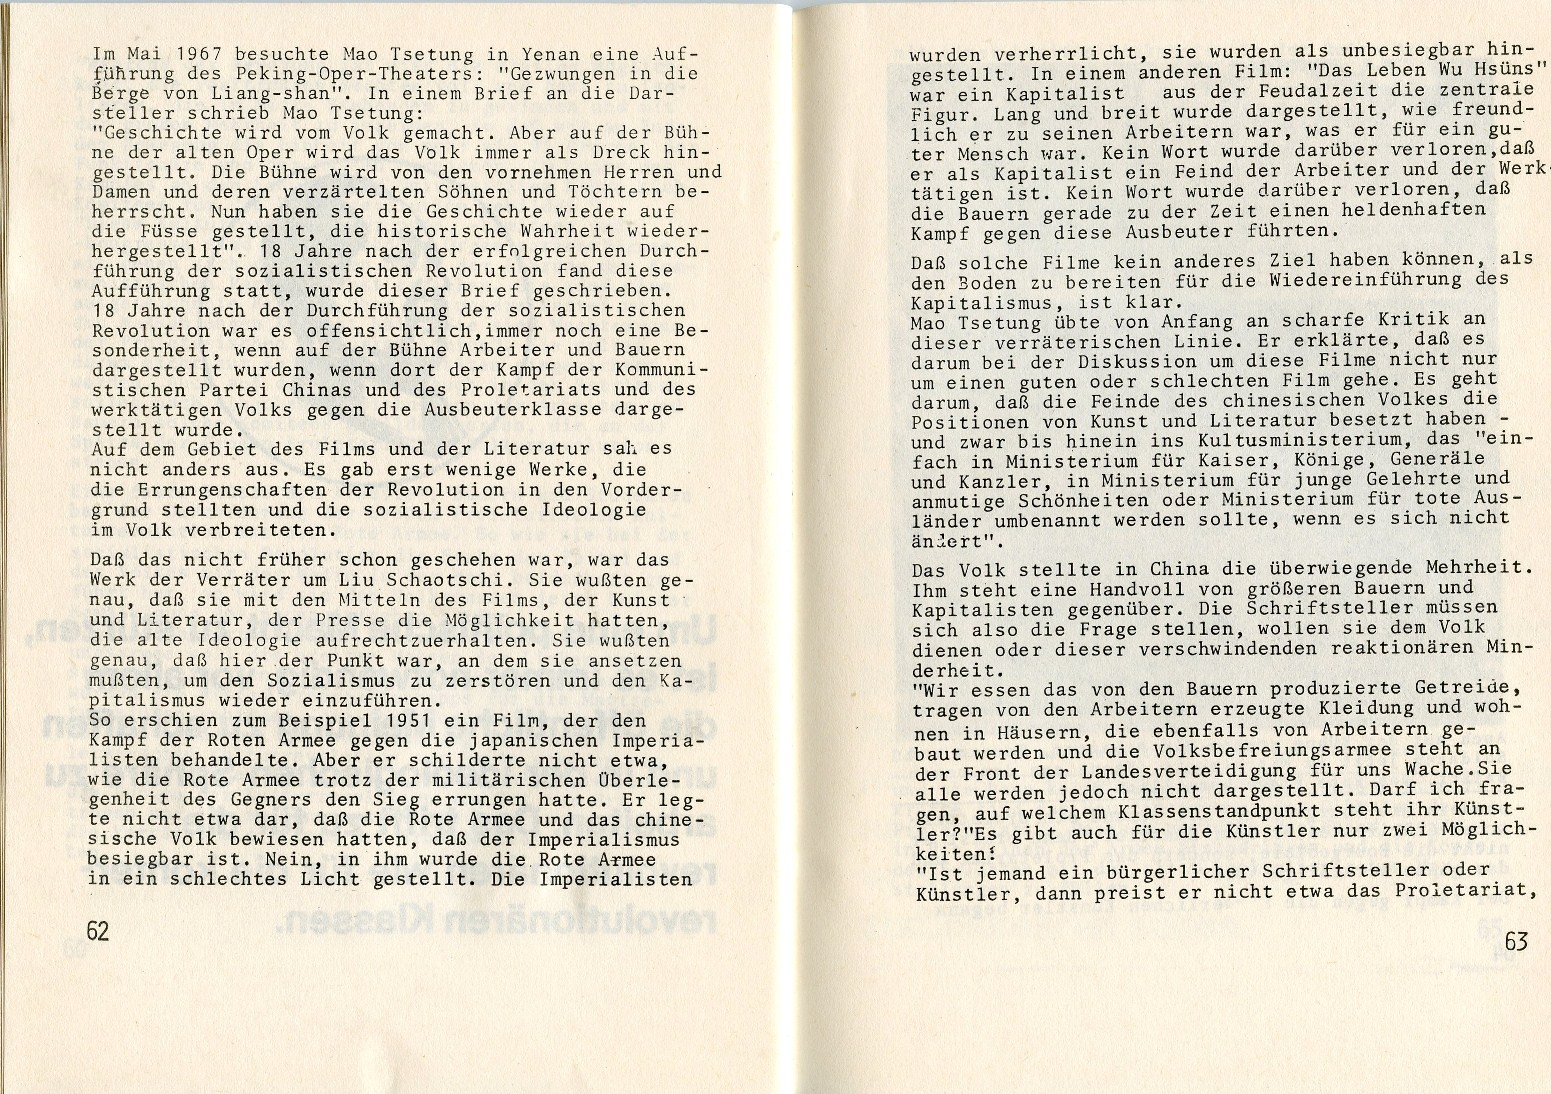 ZB_KPChinas_1971_33